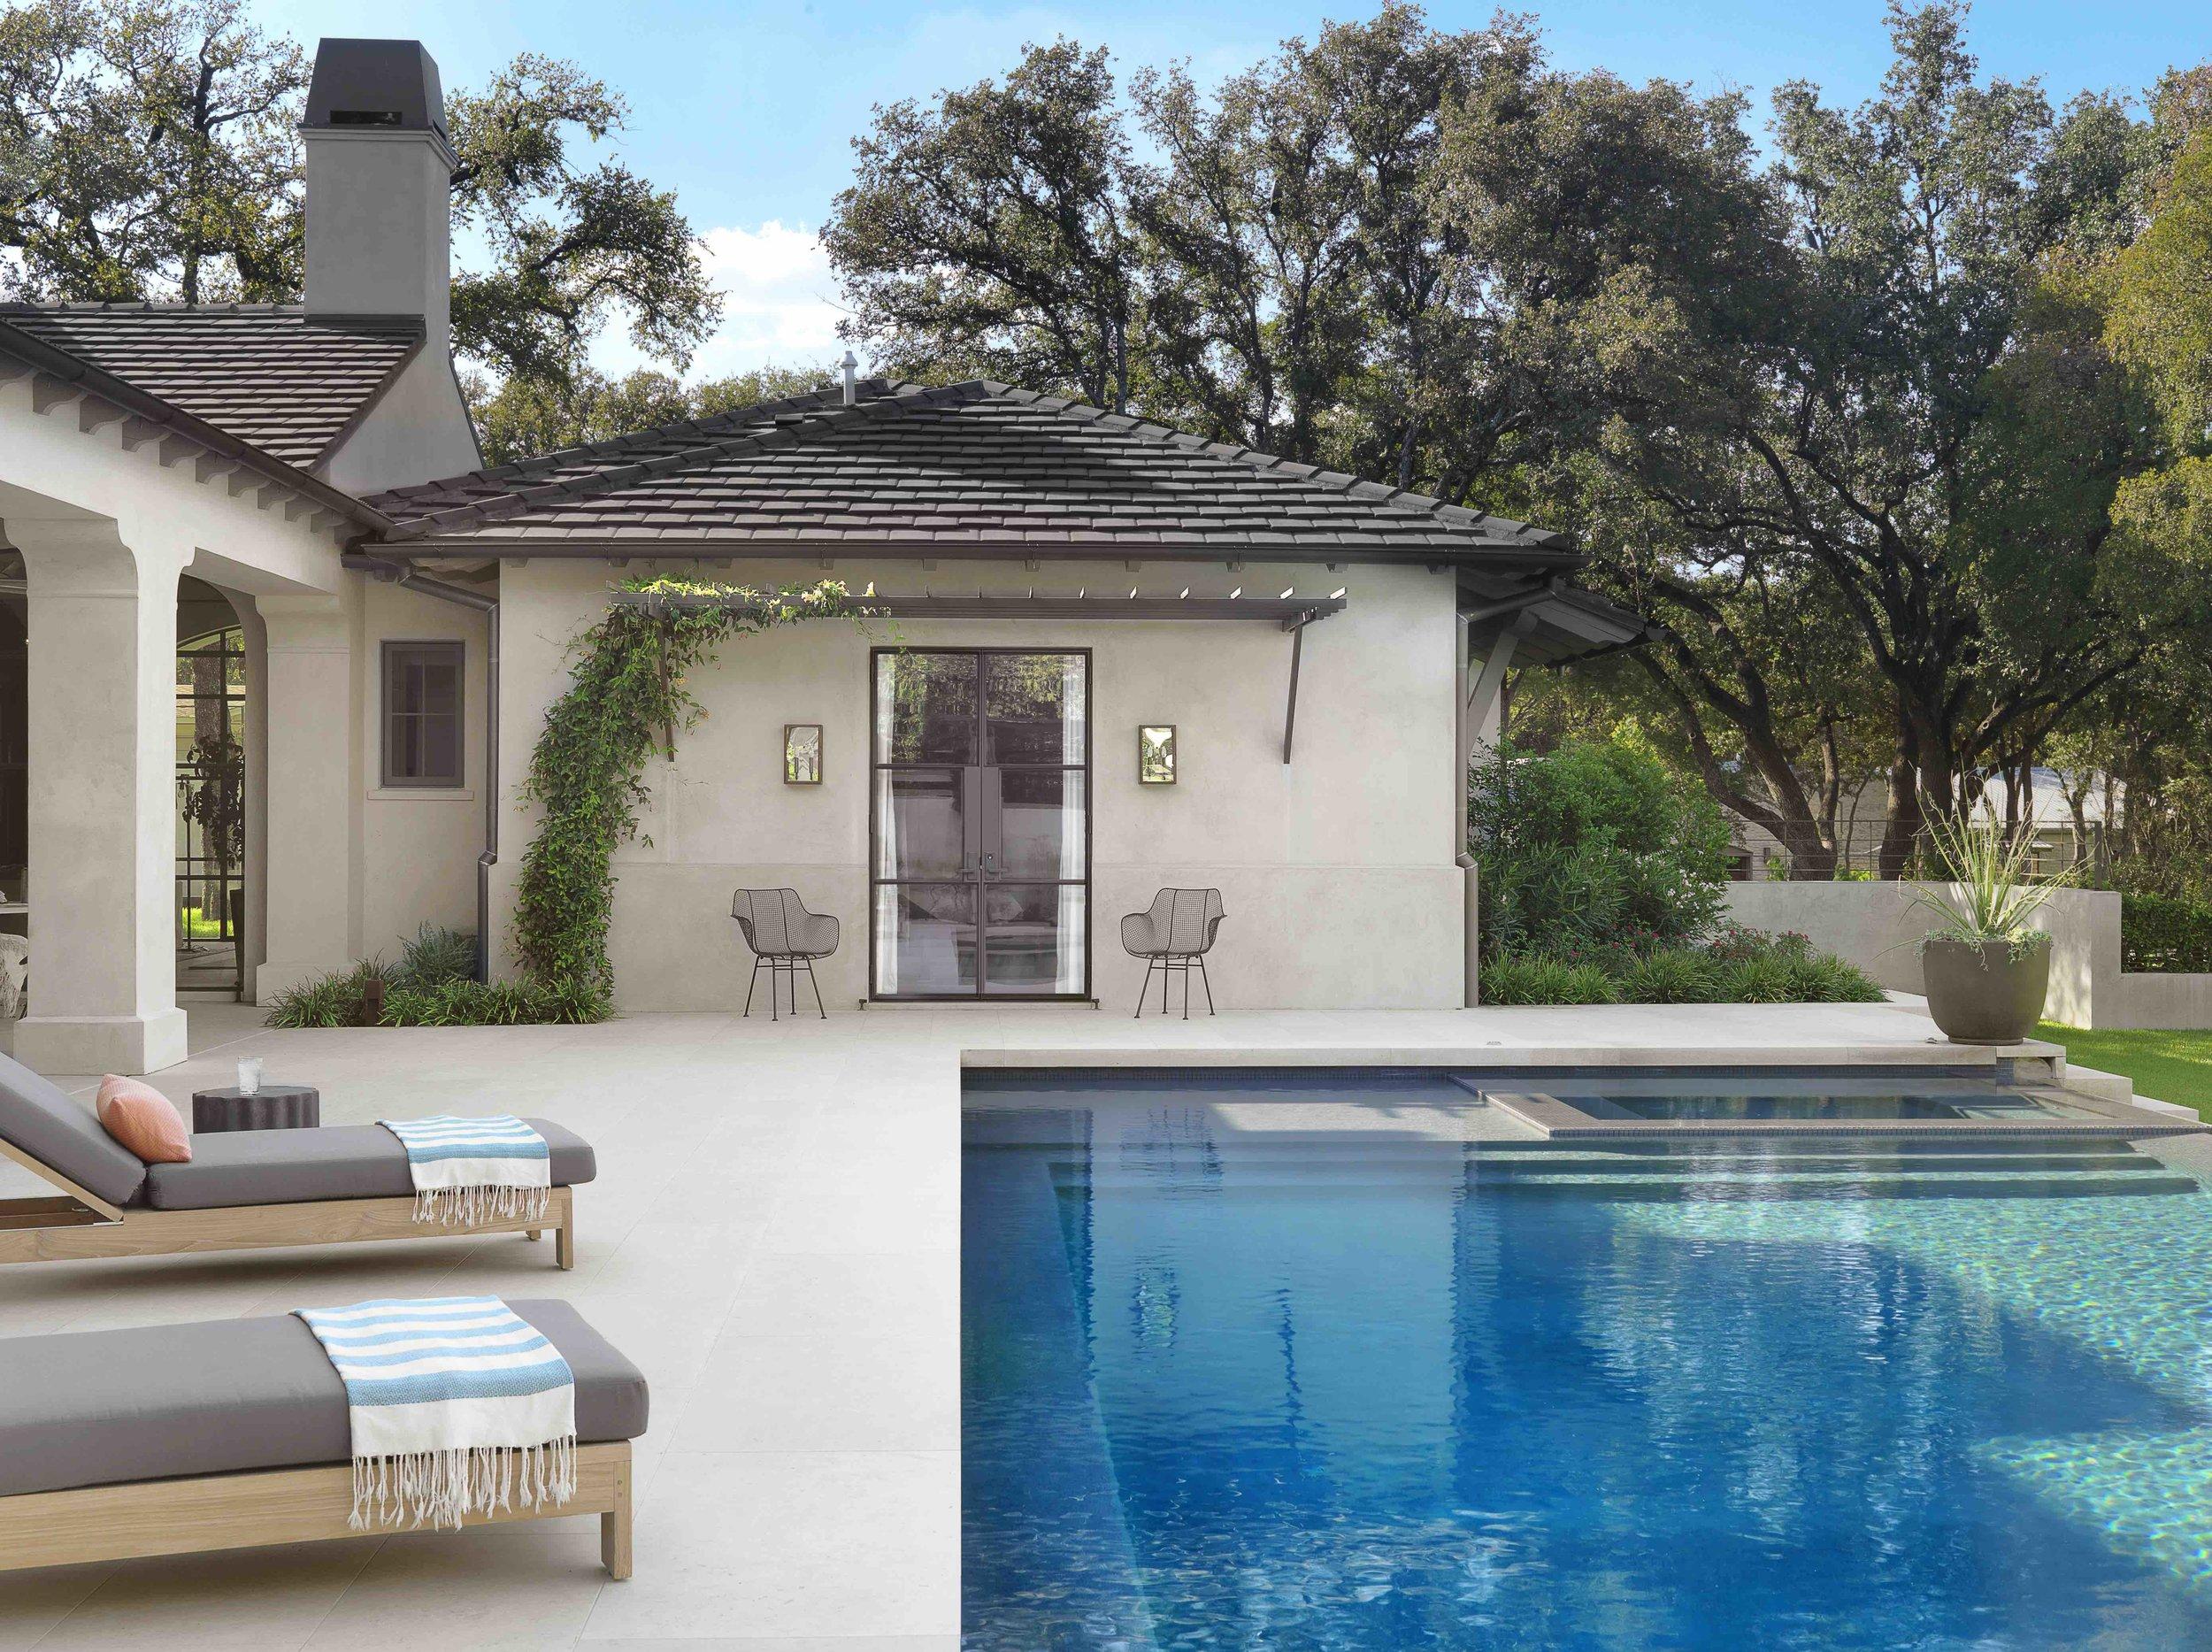 Pool to house copy.jpg